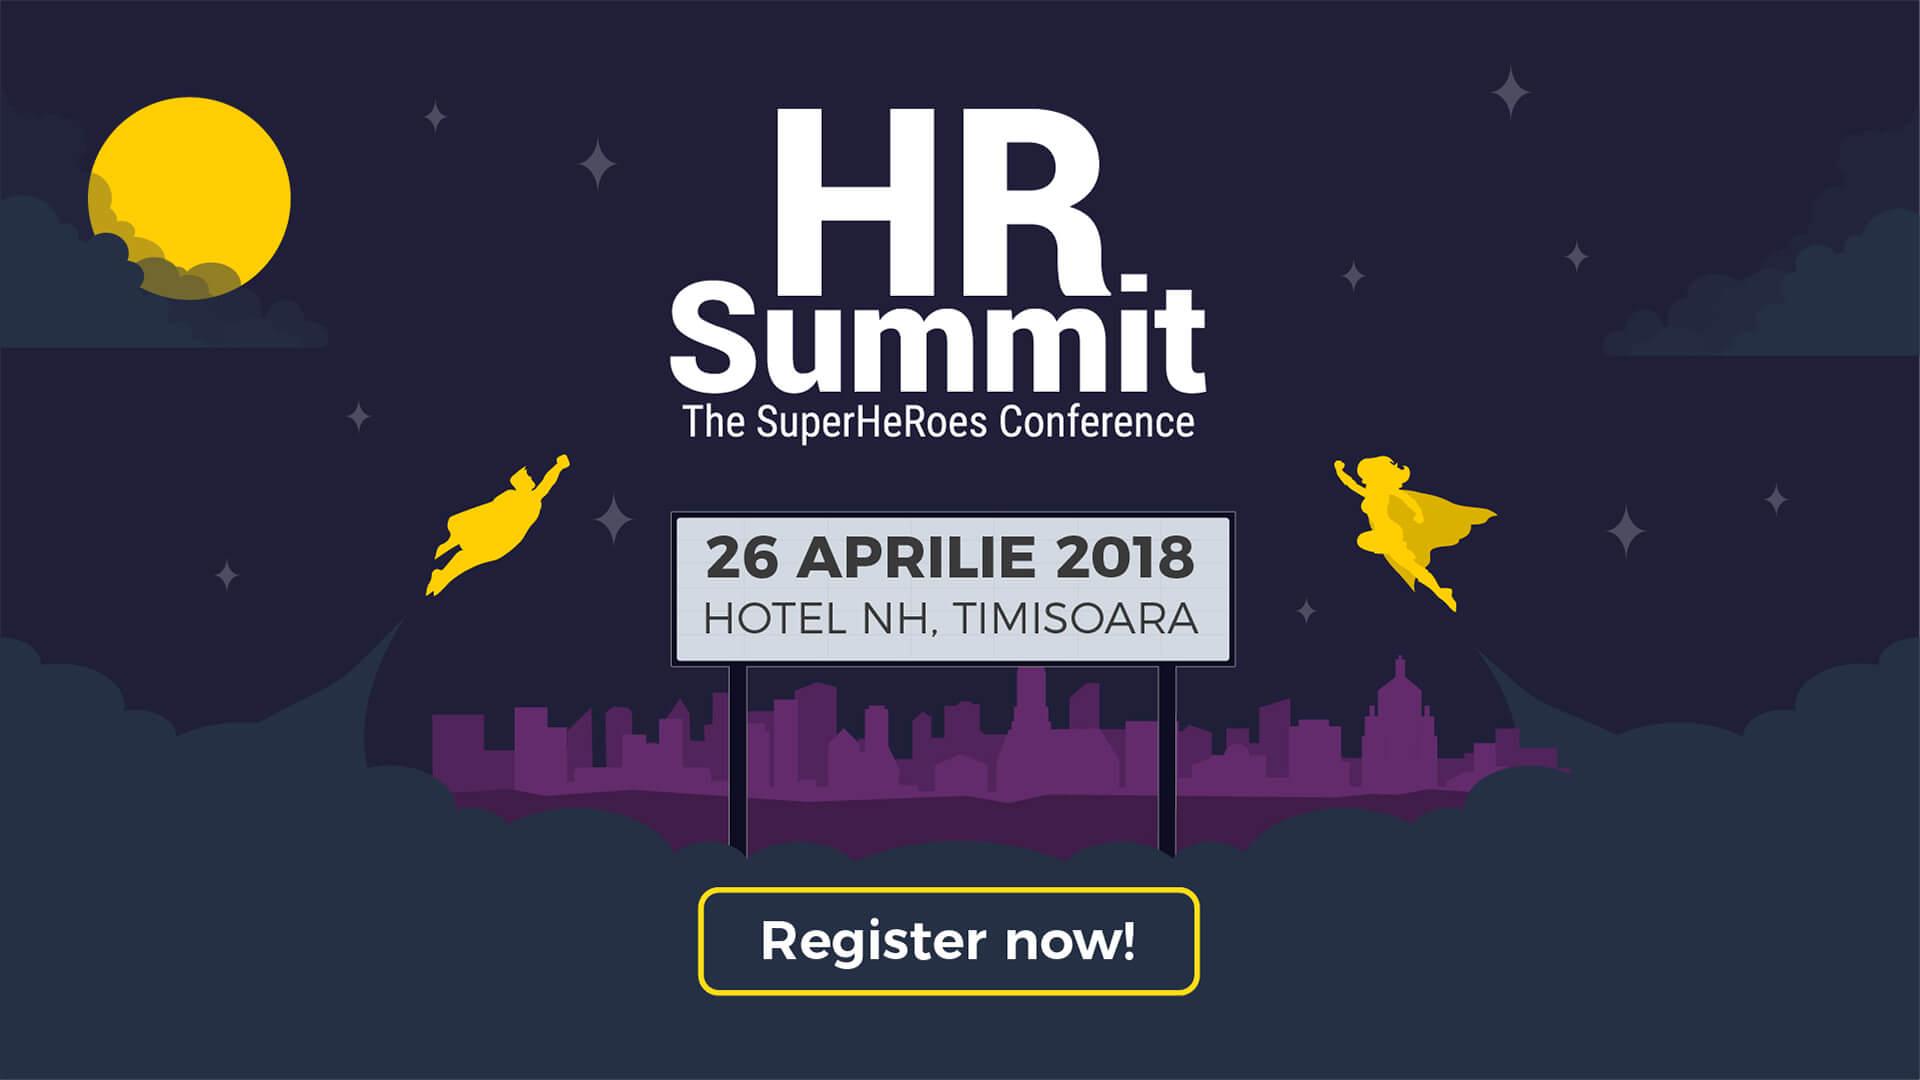 HR Summit Timisoara